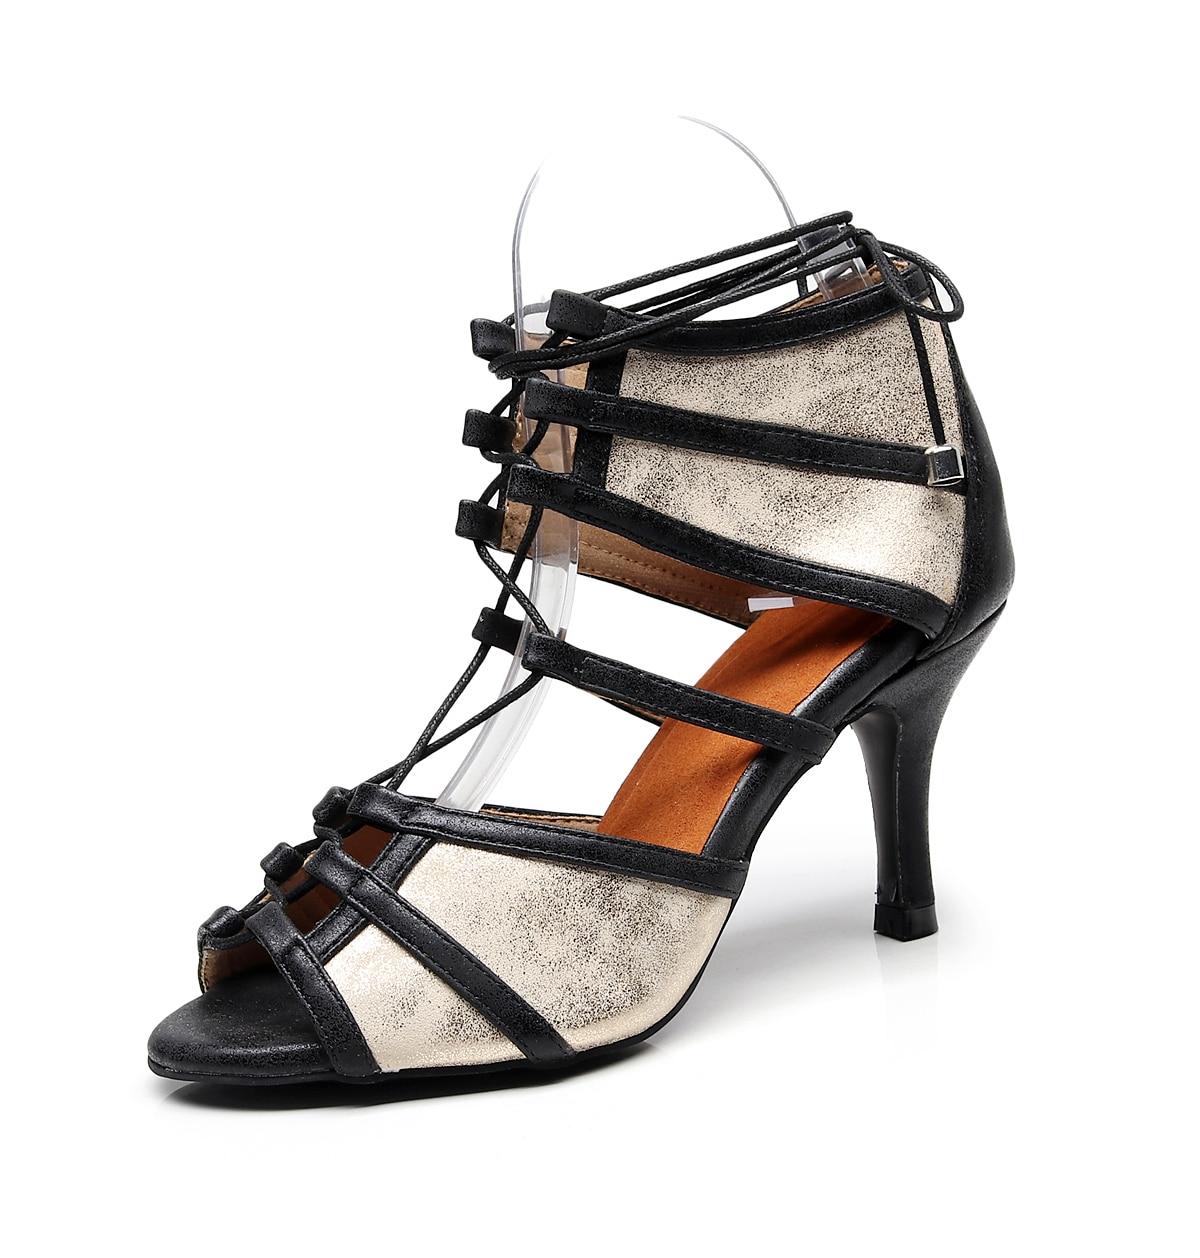 2019 nuevos zapatos de tacón alto de PU para mujeres de zapatos de baile Latino, zapatos de baile de salón Tango Latino, zapatos de baile negro para chicas EU34-43